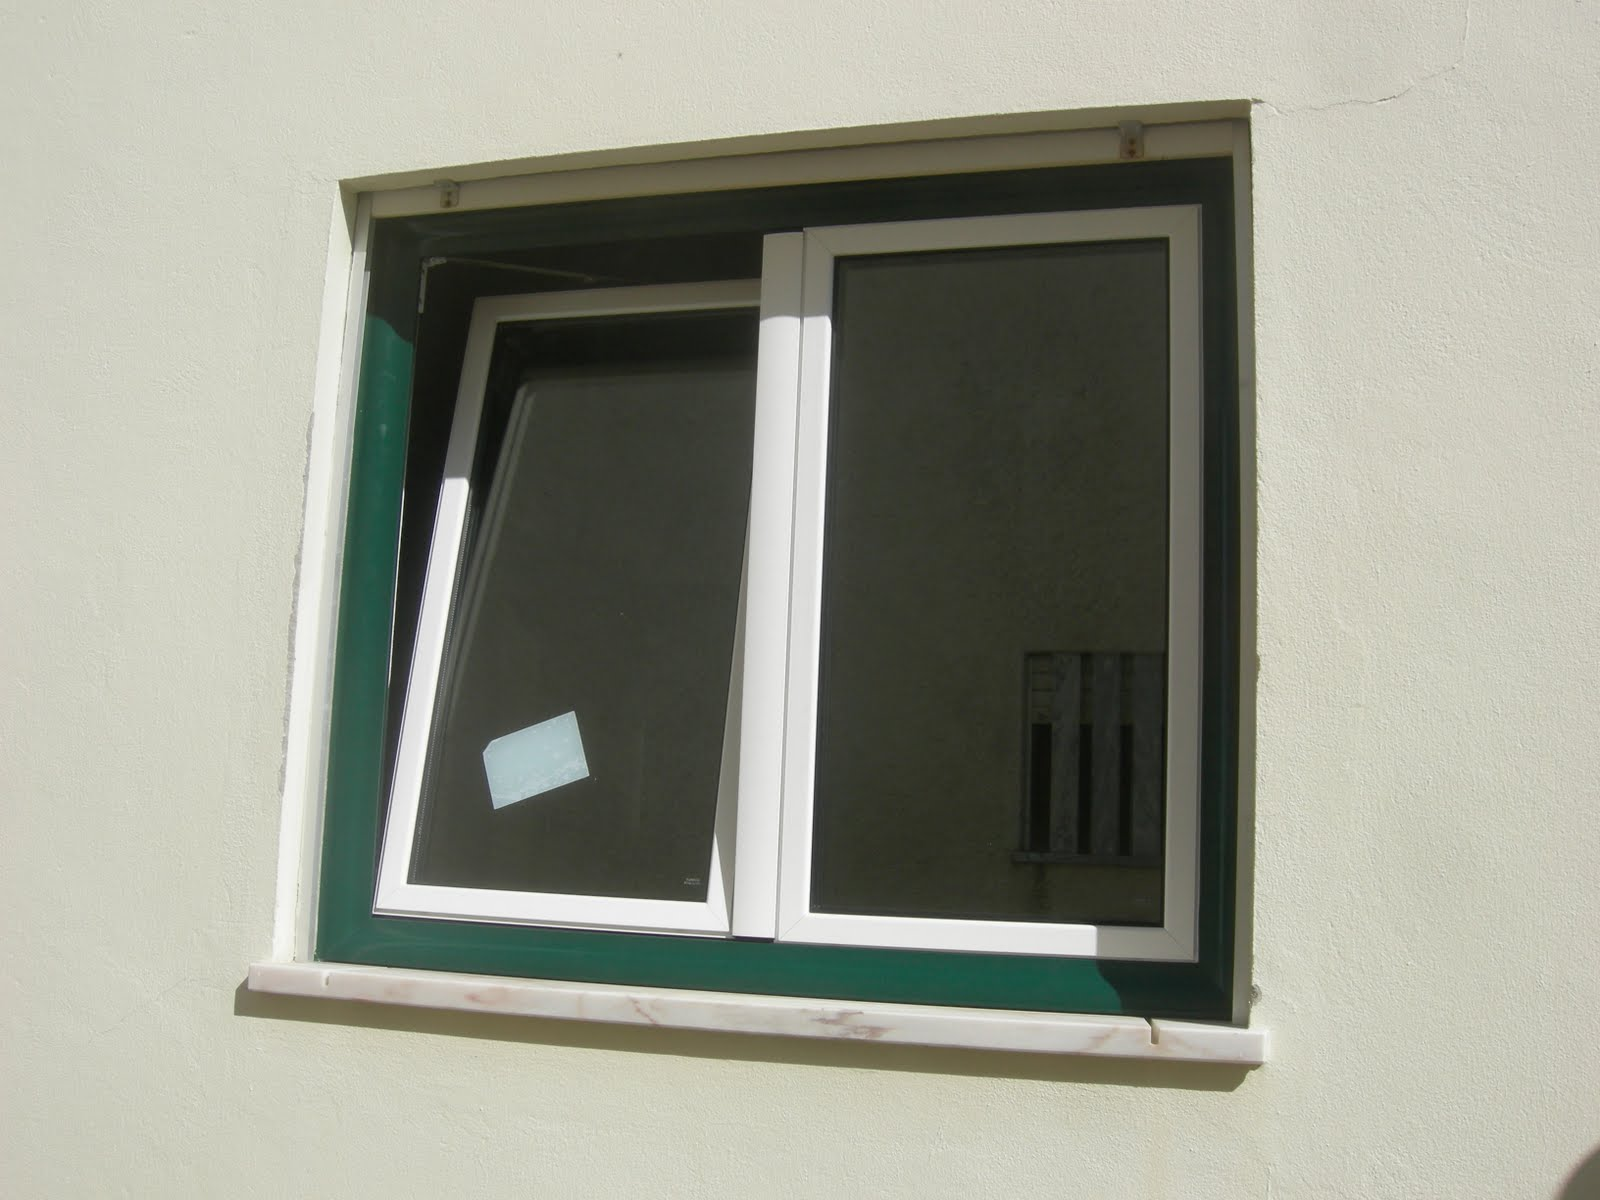 #34594C casa com janelas: Junho 2010 480 Janelas Duplas Ou Vidros Duplos